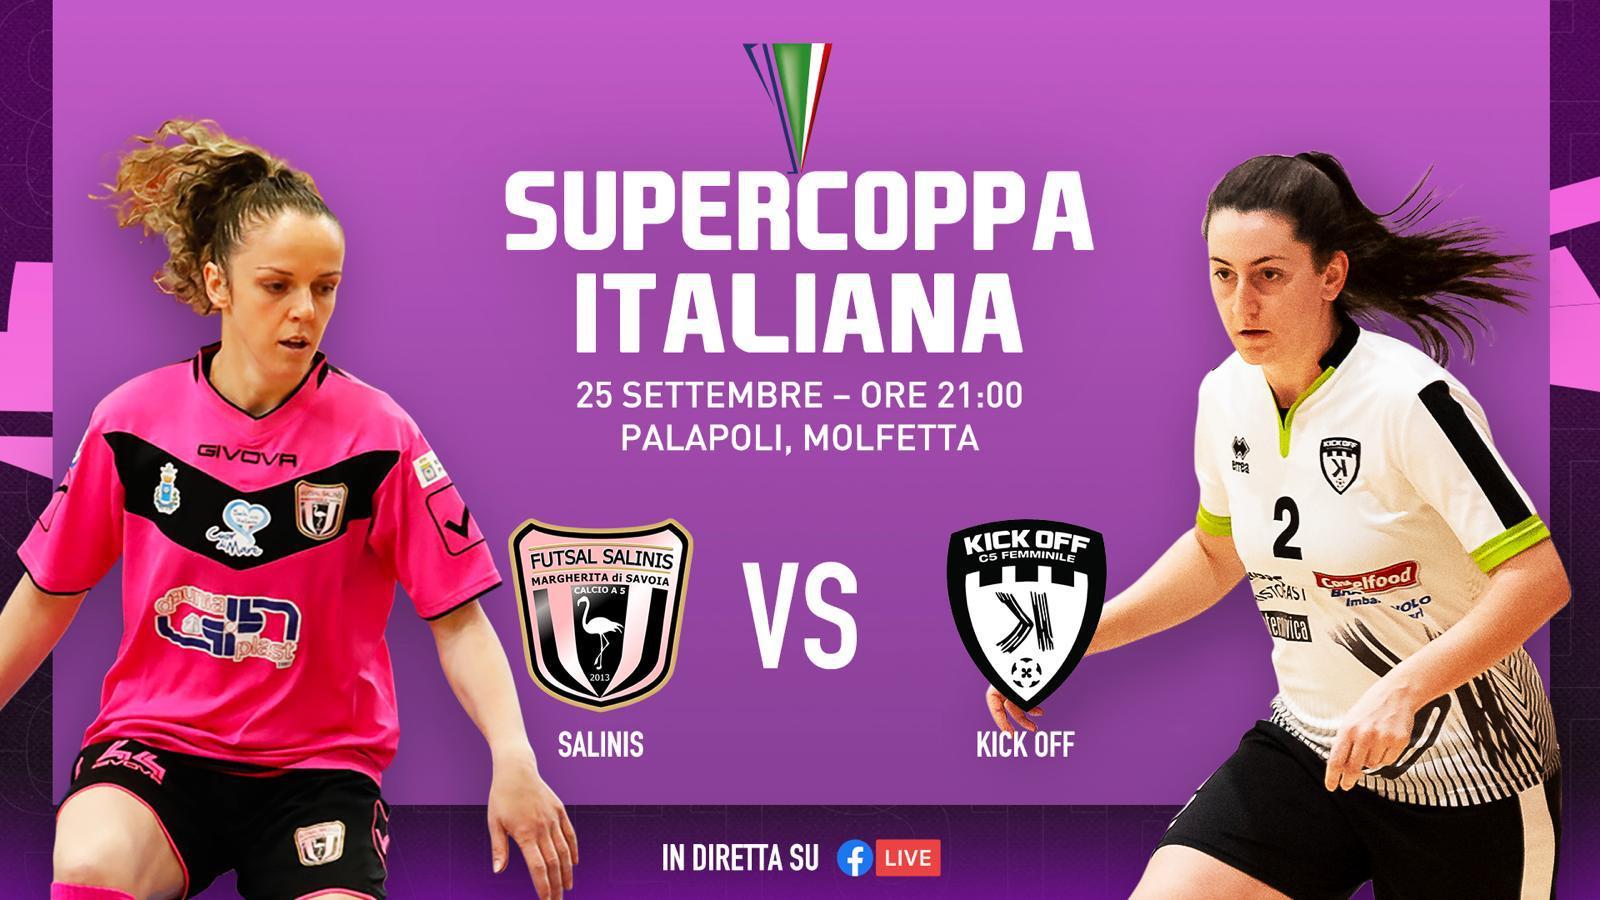 Supercoppa italiana femminile 2019